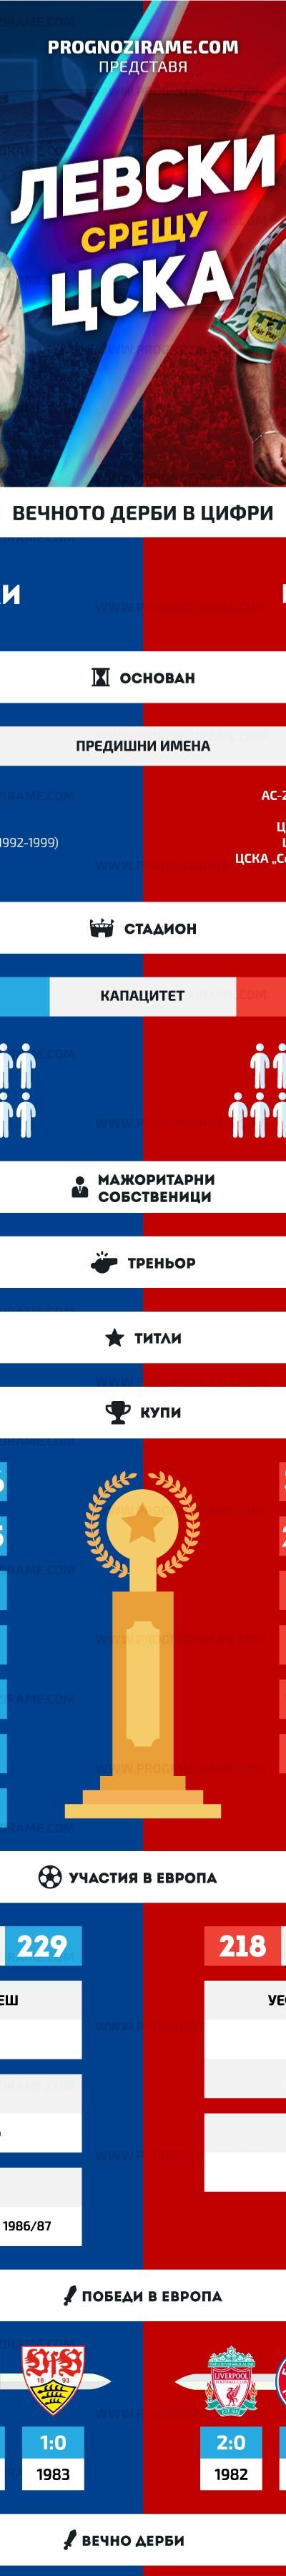 Левски срещу ЦСКА - prognozirame.com [2]